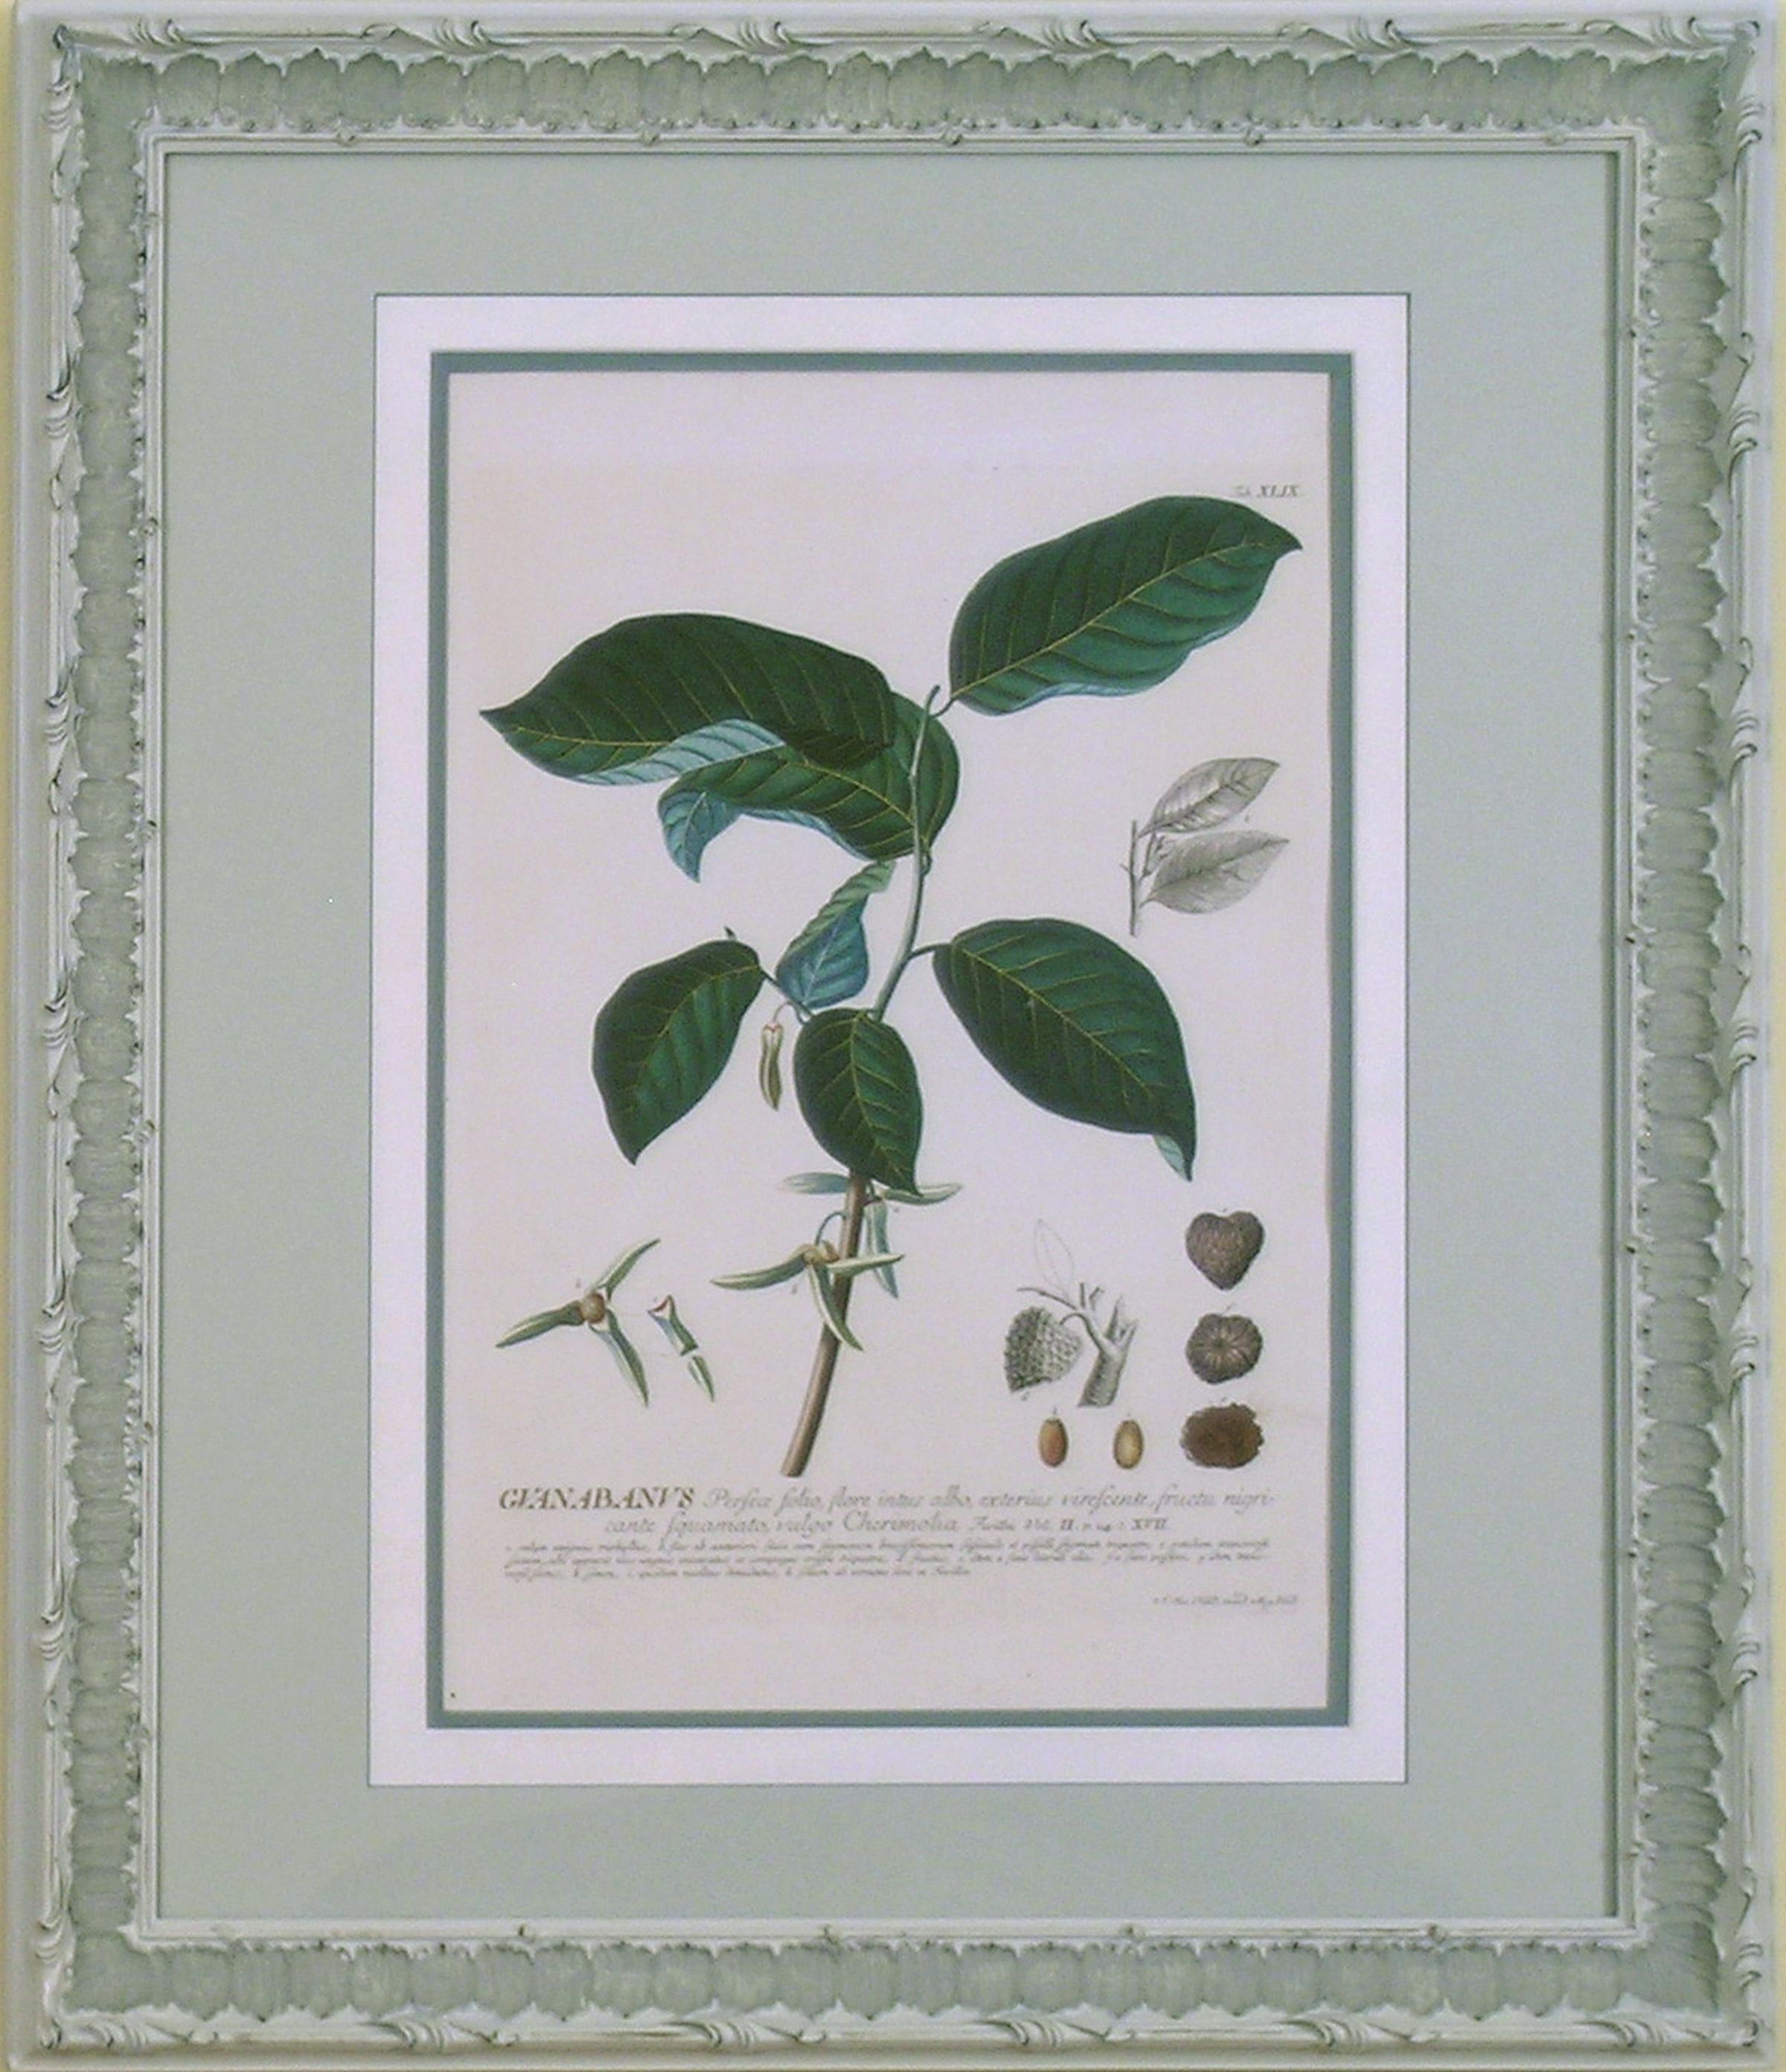 Guanabanus (Guabana or Soursop Fruit)